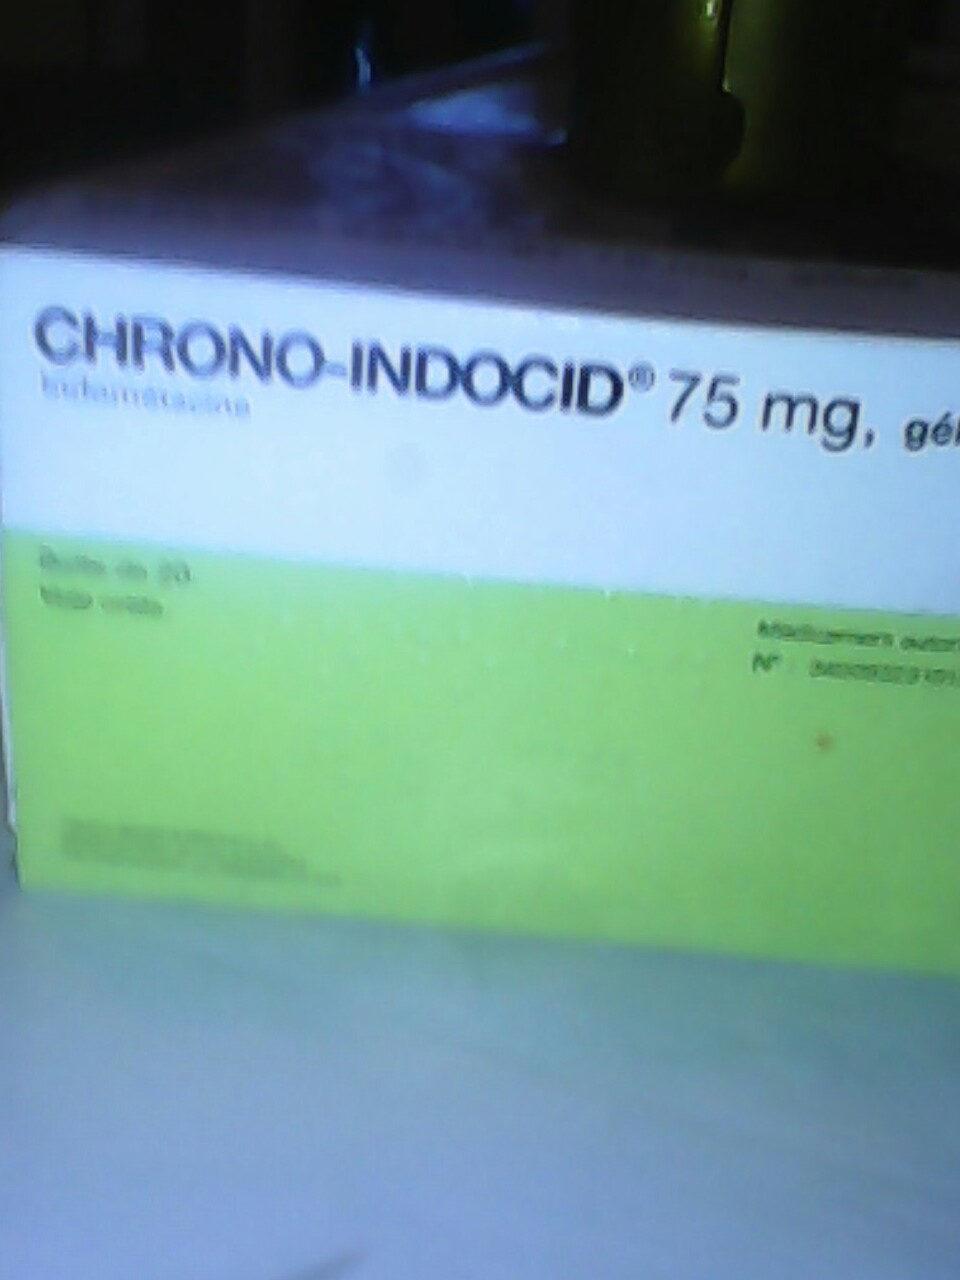 chrono indocid - Product - fr